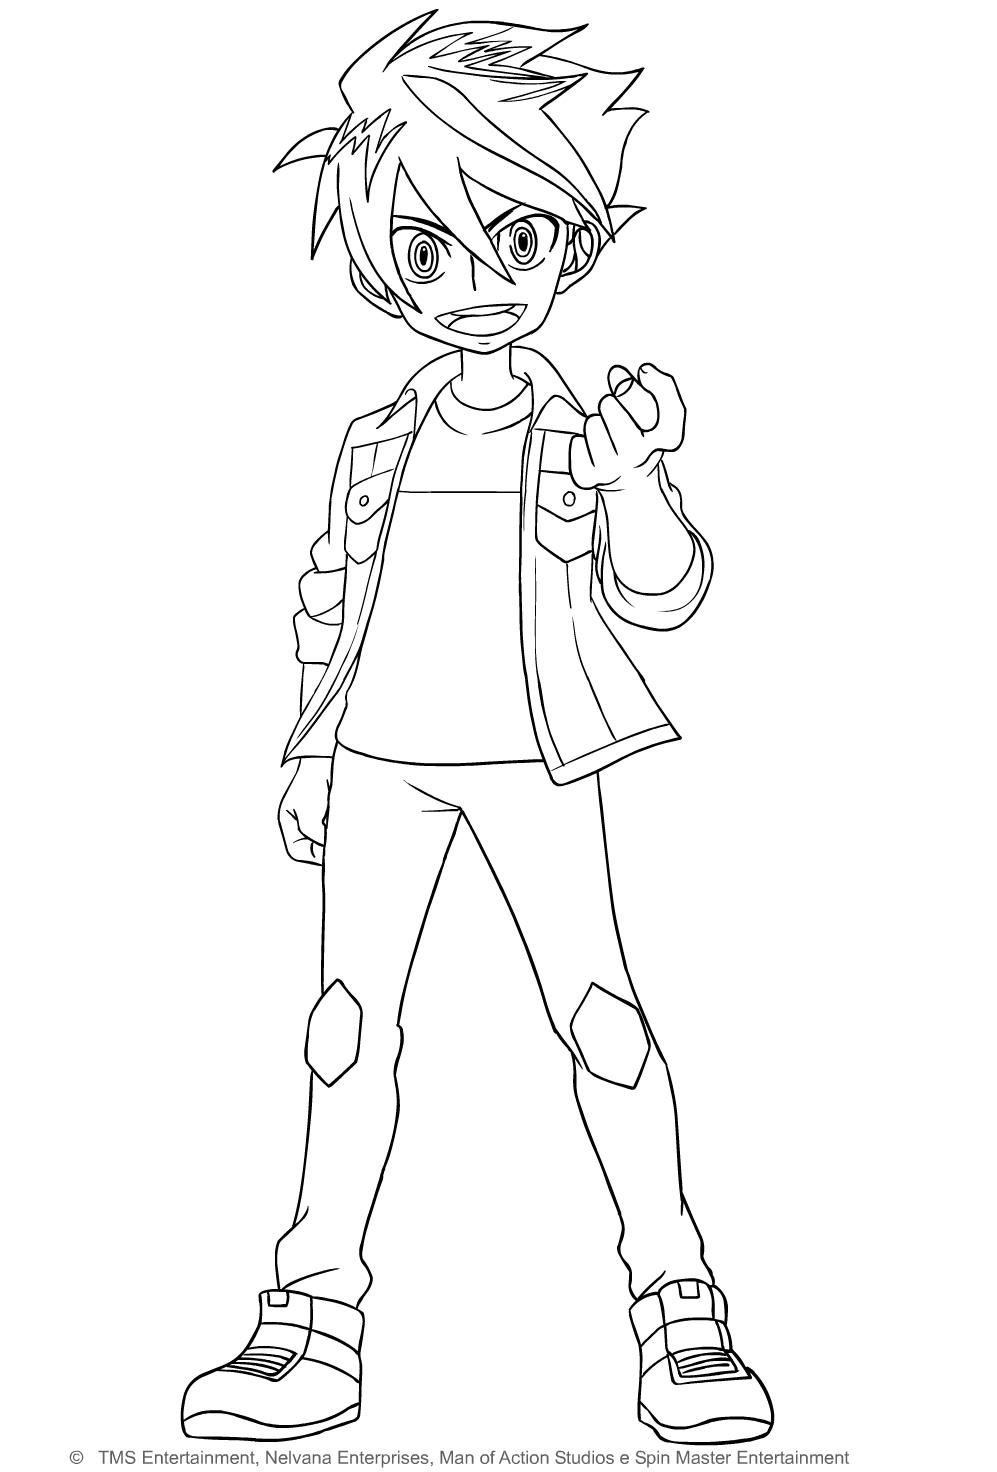 Desenho de Dan Kouzo de Bakugan Battle Planet para imprimir e colorir